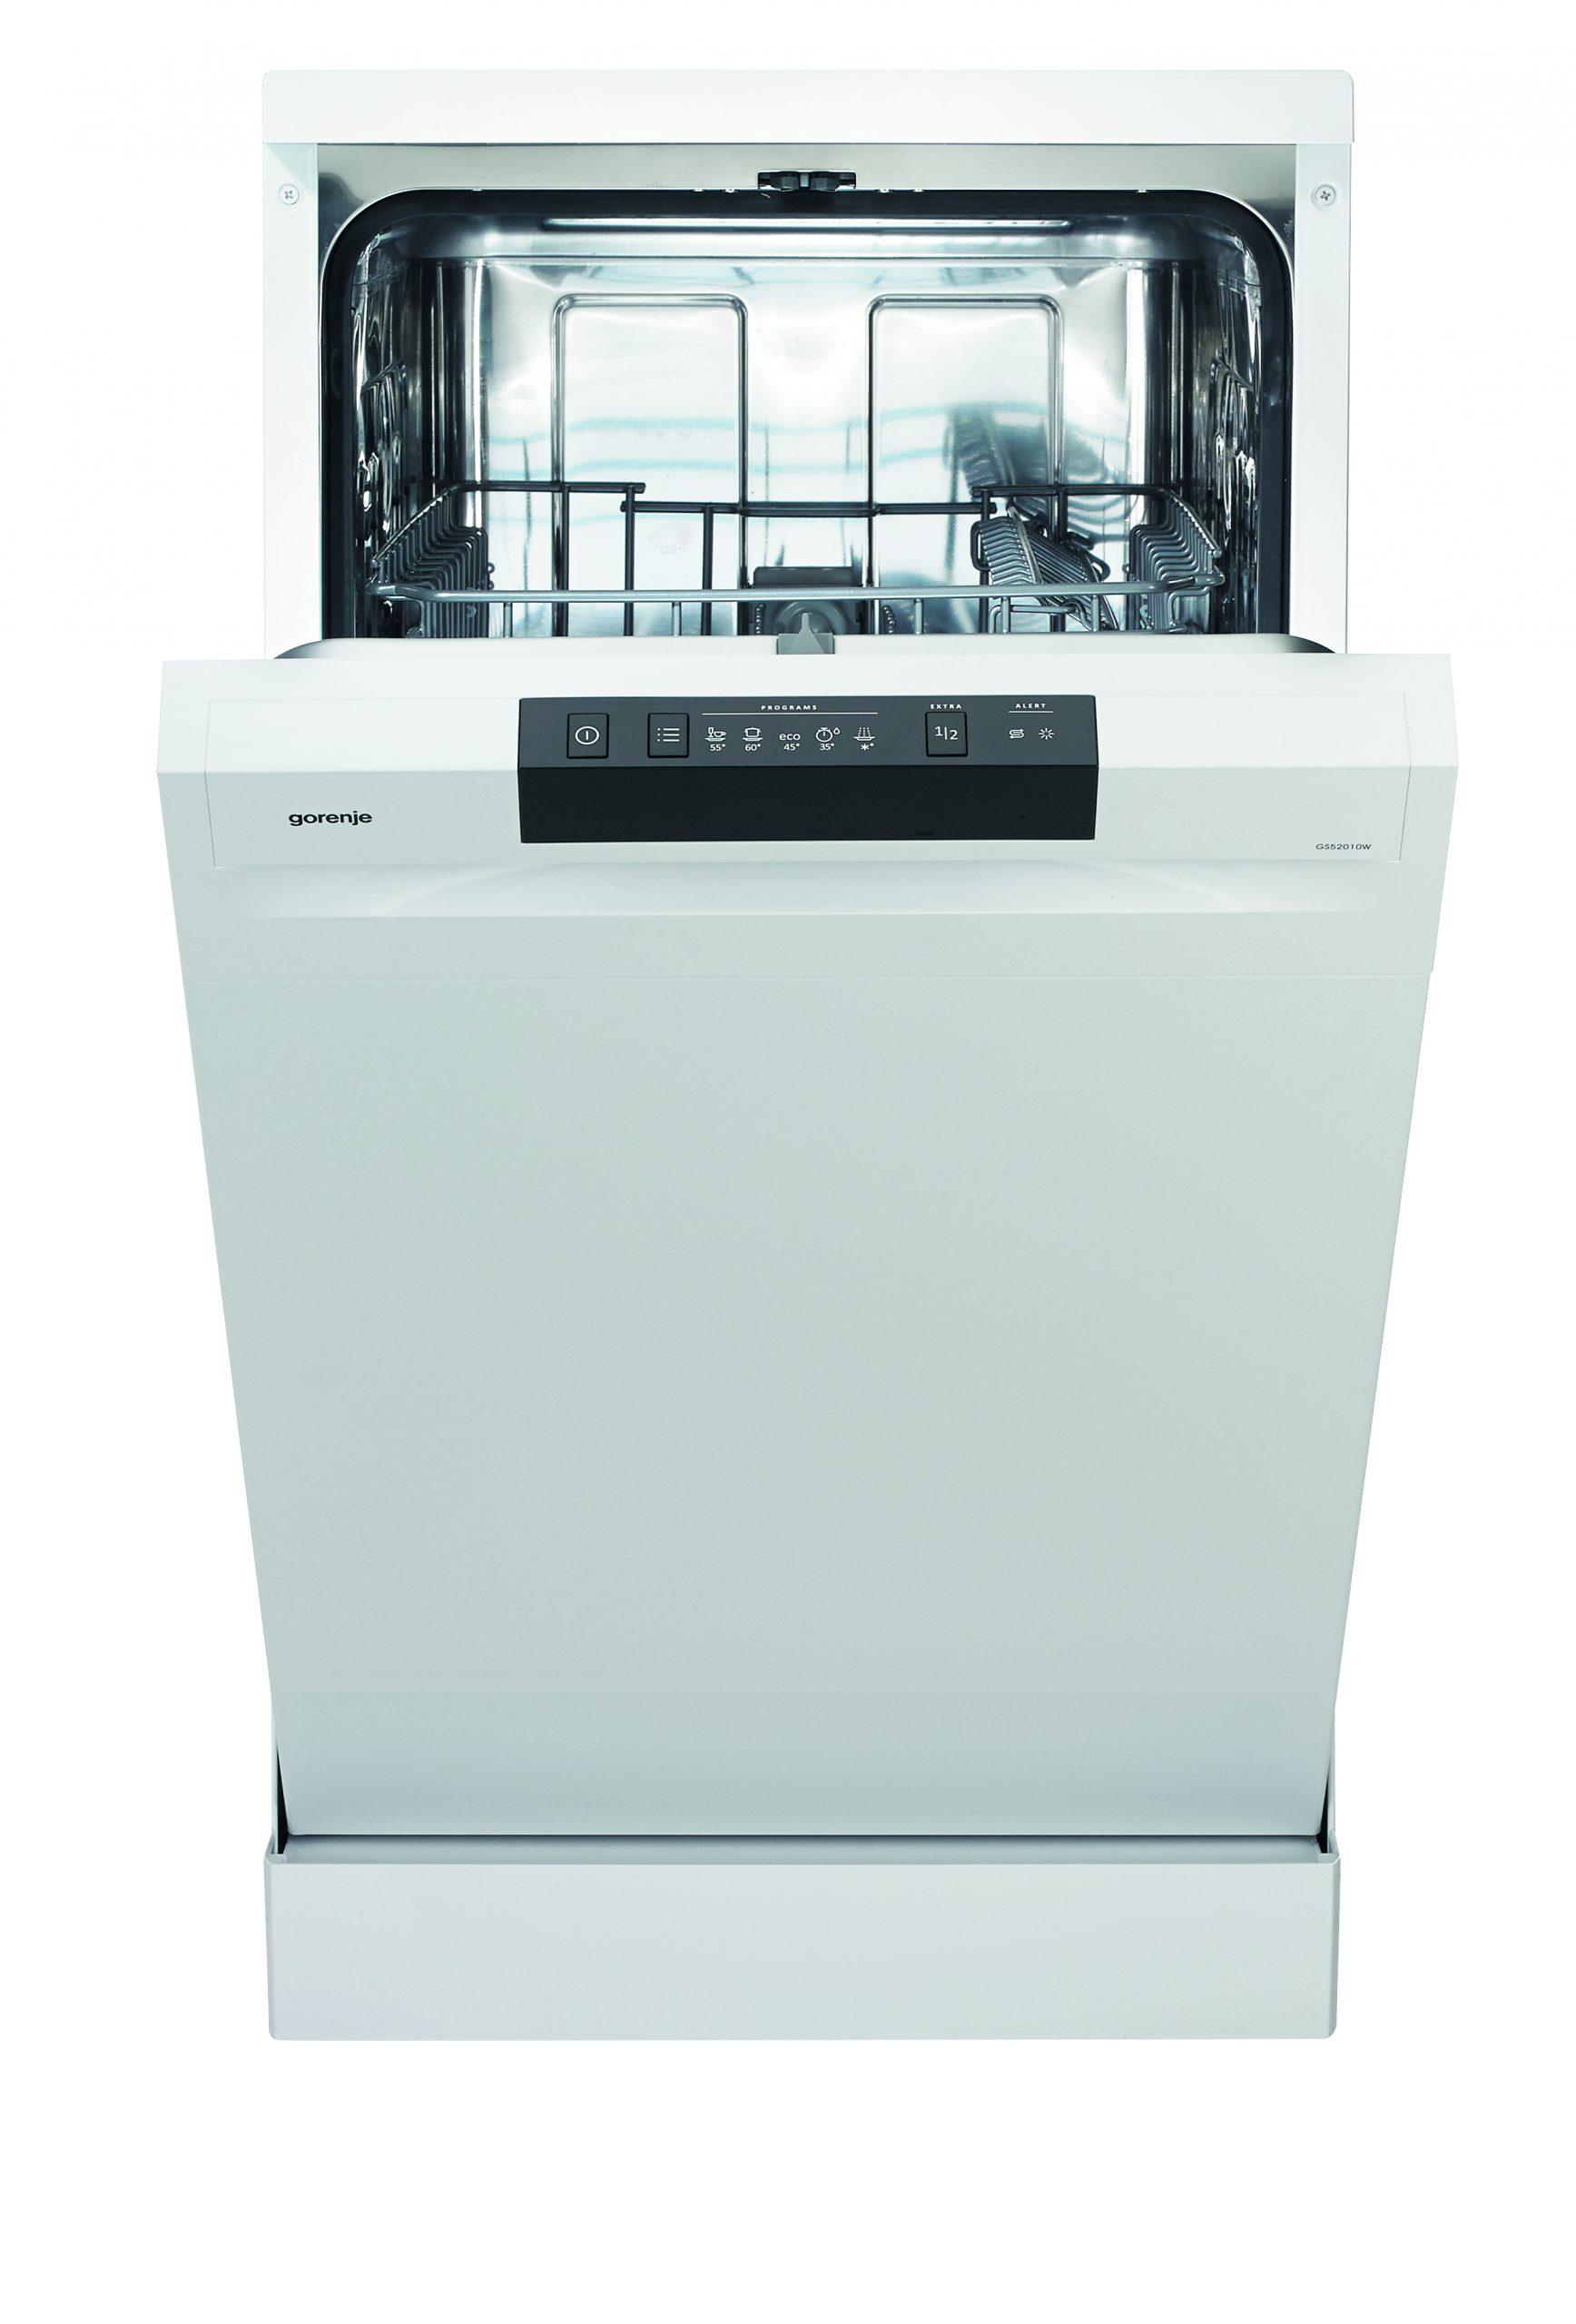 Посудомоечная машина Gorenje GS52010W 56692190633048 - 4